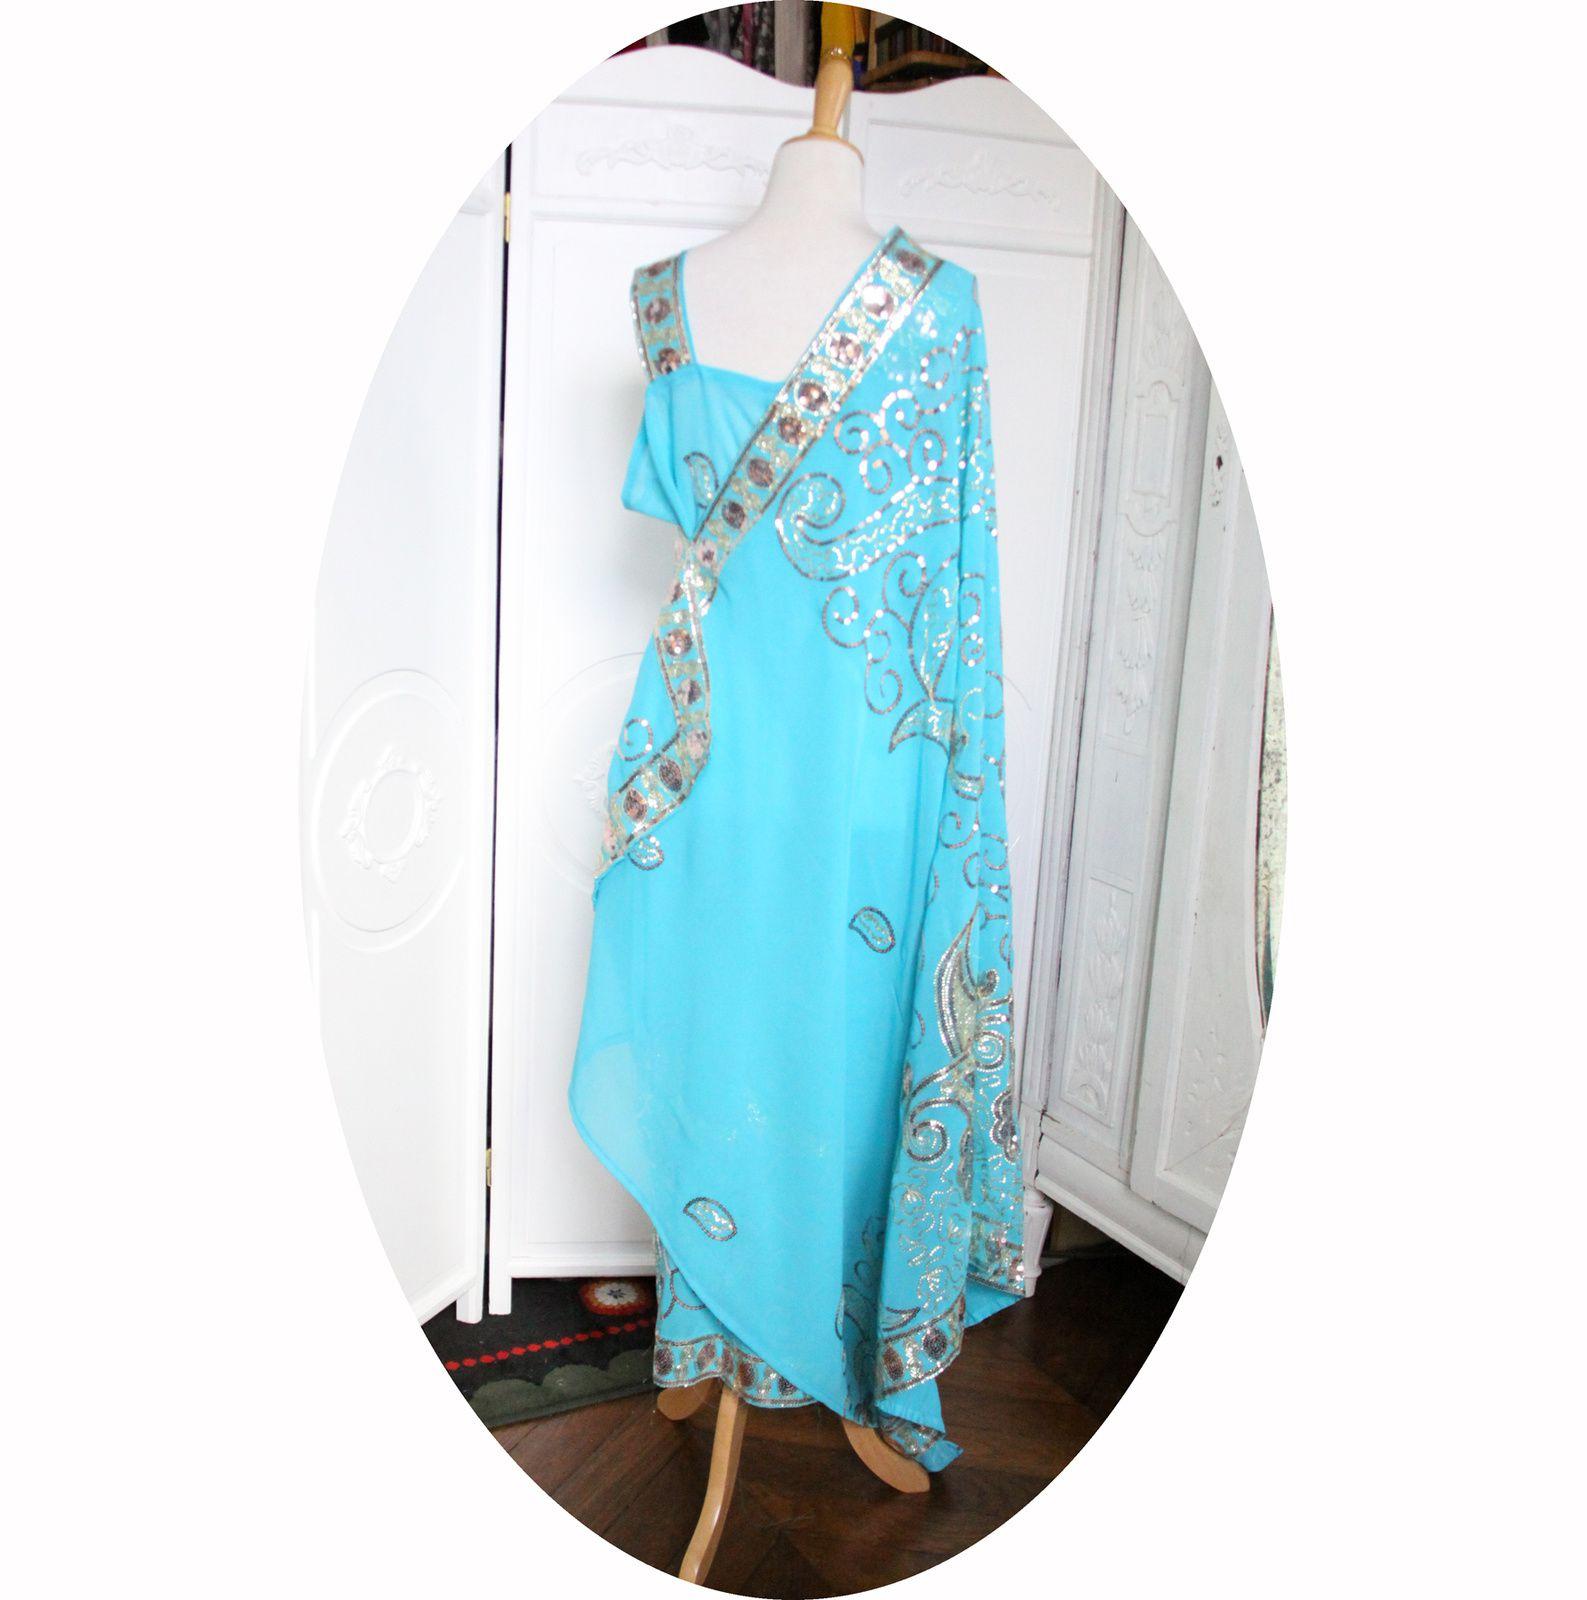 Robe longue sari bleue turquoise, robe indienne en voile bleu, sari indien brode